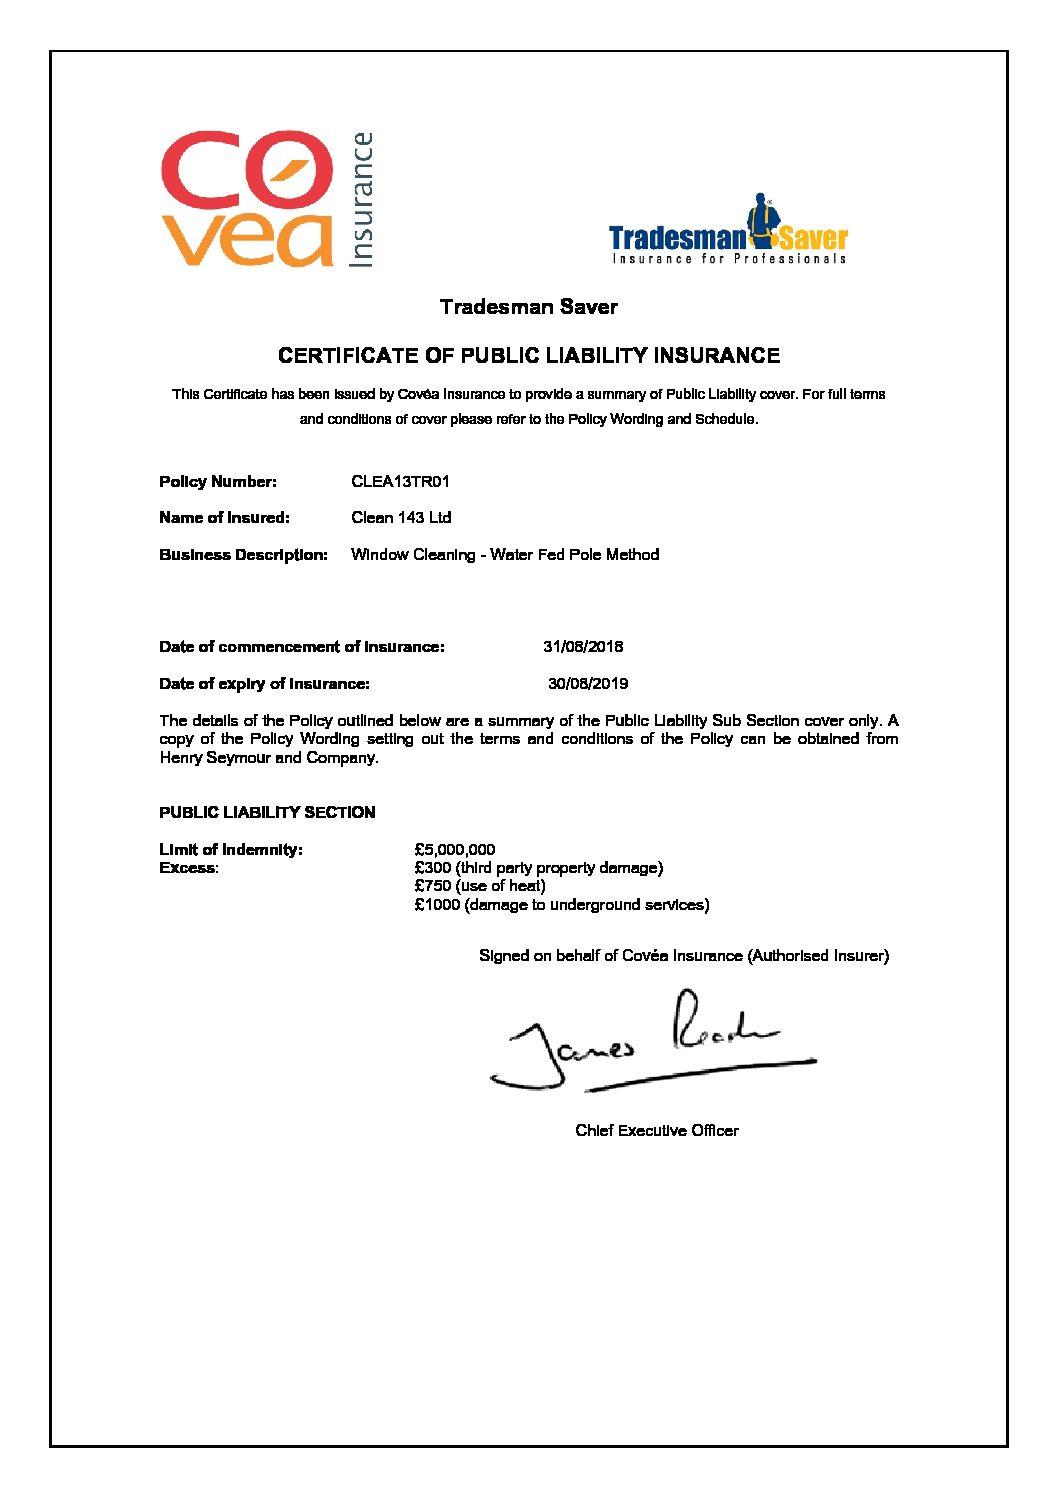 General Liability Certificate of Insurance - Clean143